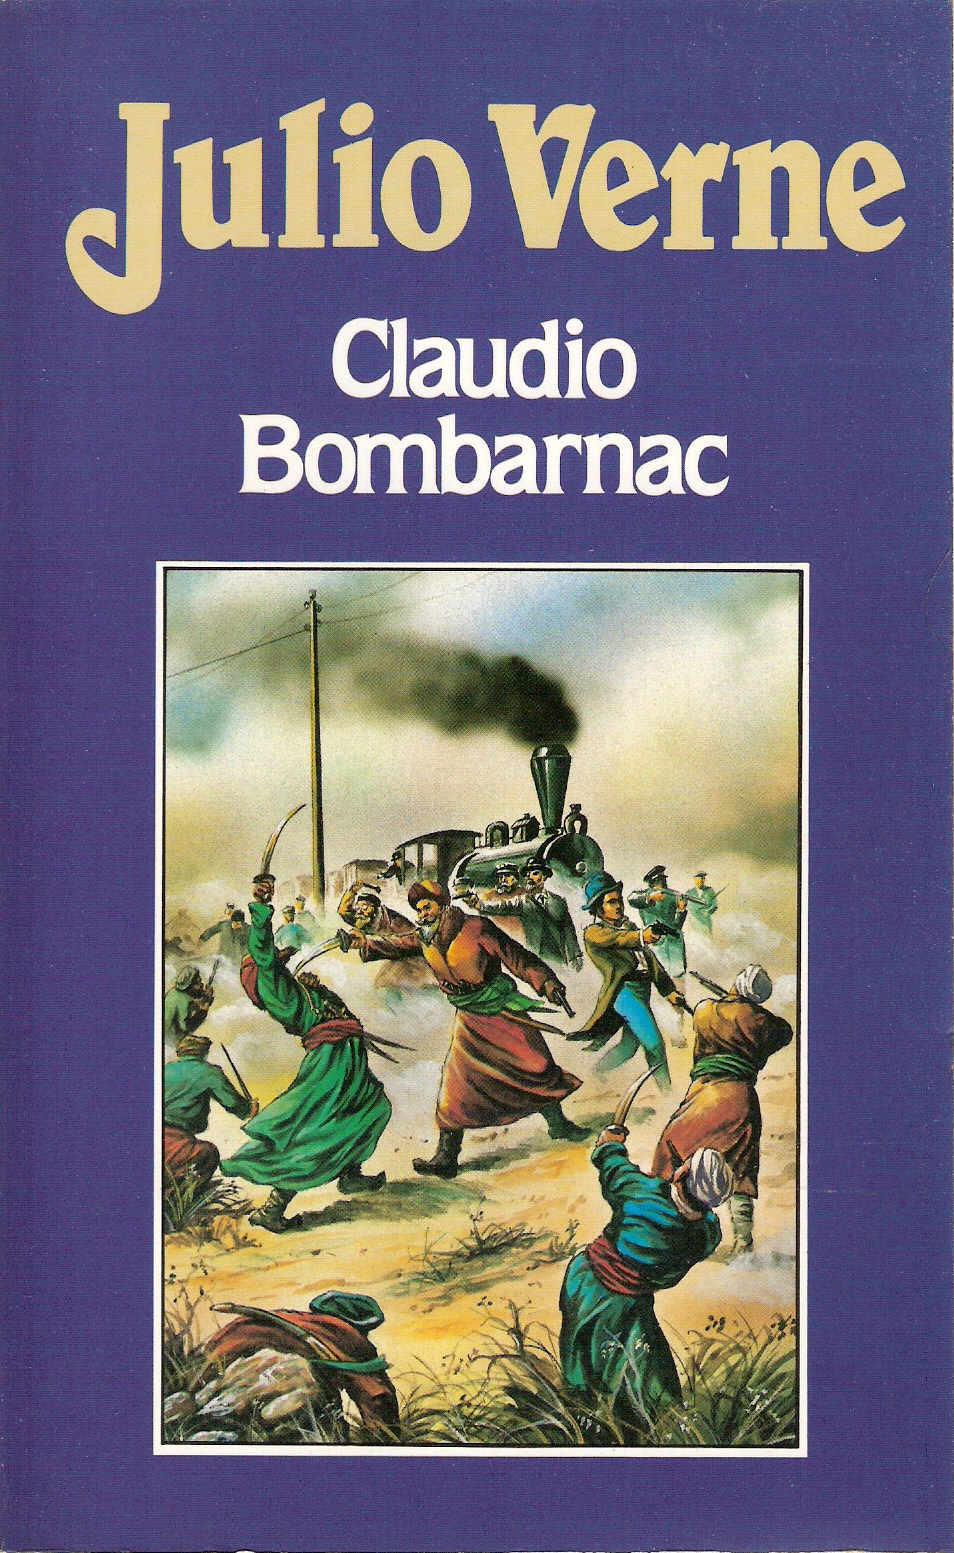 Claudio Bomarnac